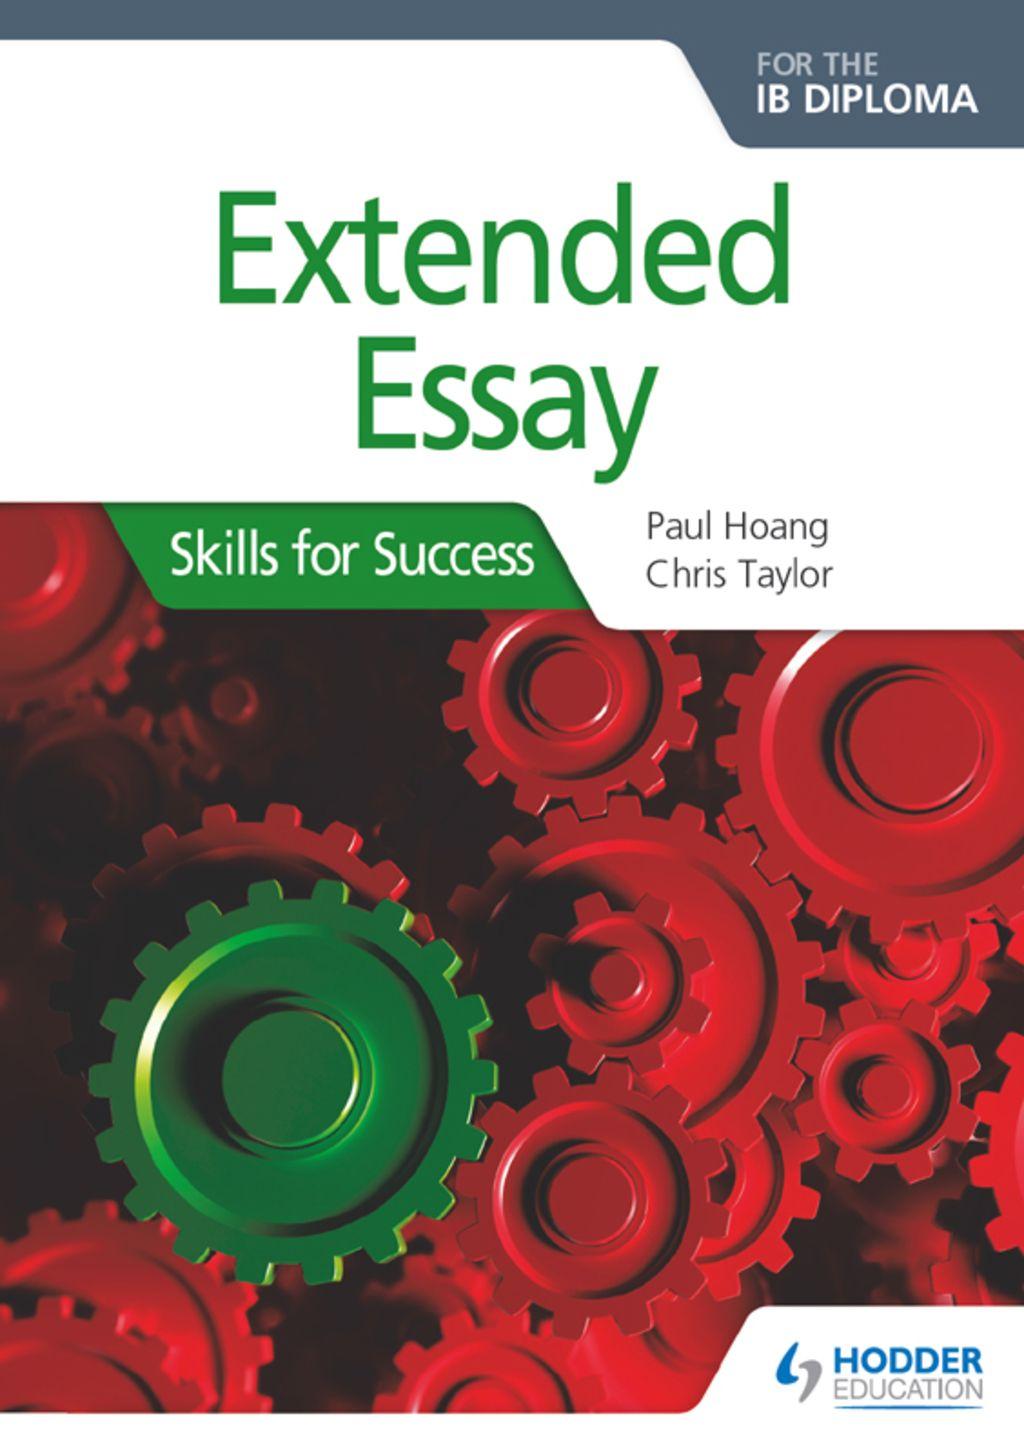 Order esl descriptive essay on lincoln